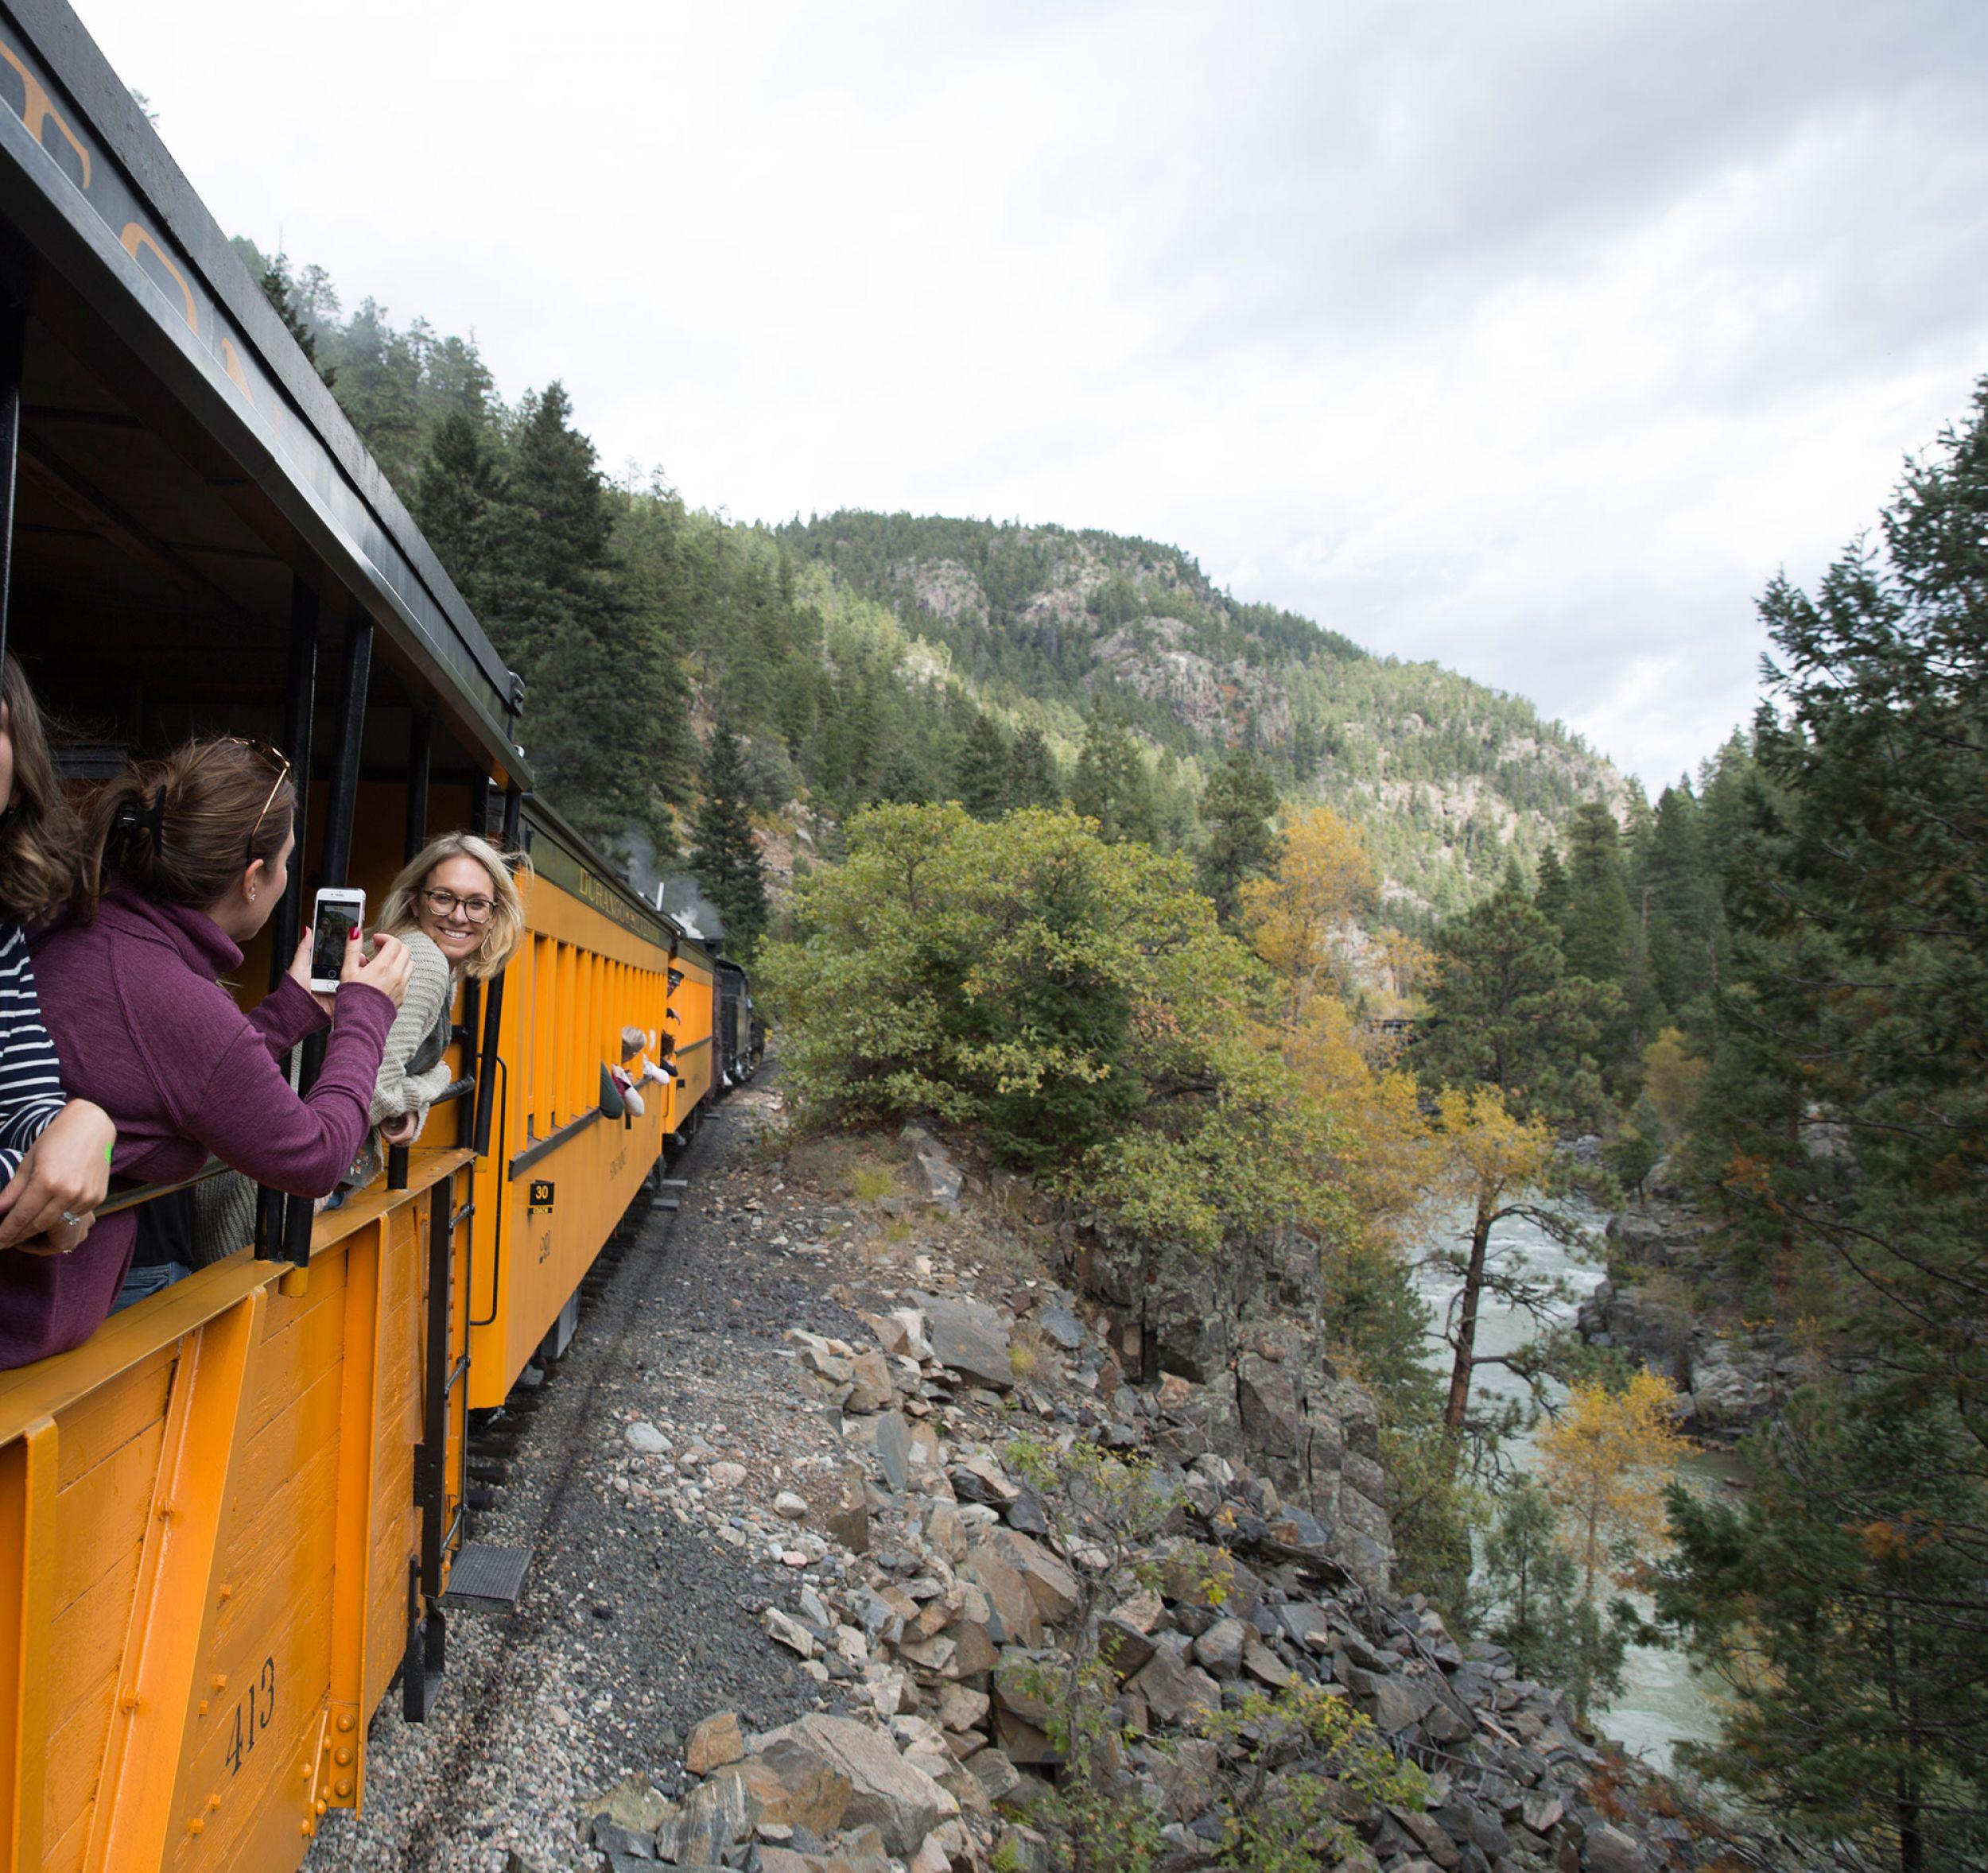 American Heritage Railways | American Heritage Railways